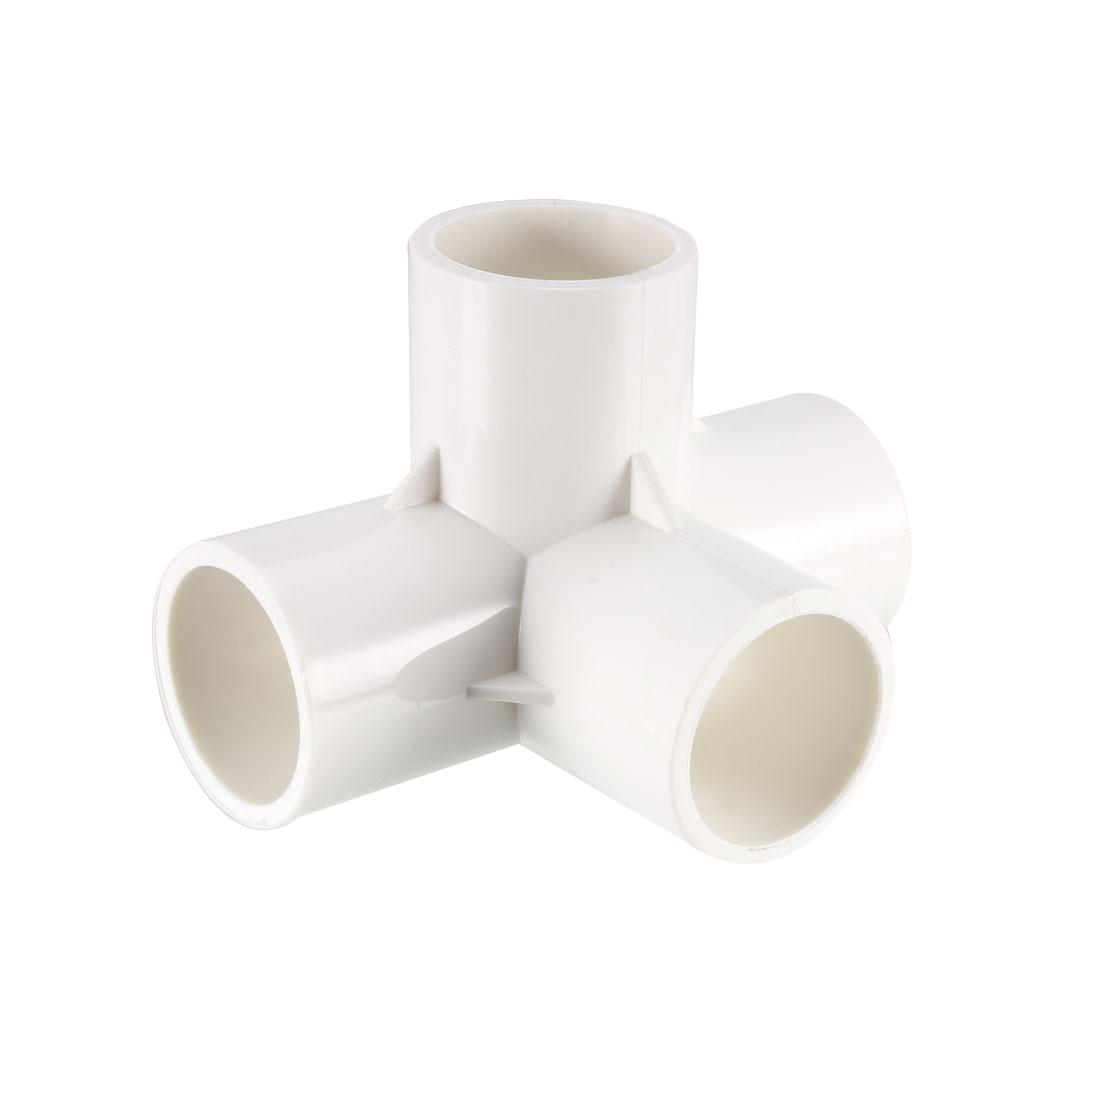 4 Way 25mm Tee PVC Fitting Elbow - PVC Furniture - PVC Elbow Fittings